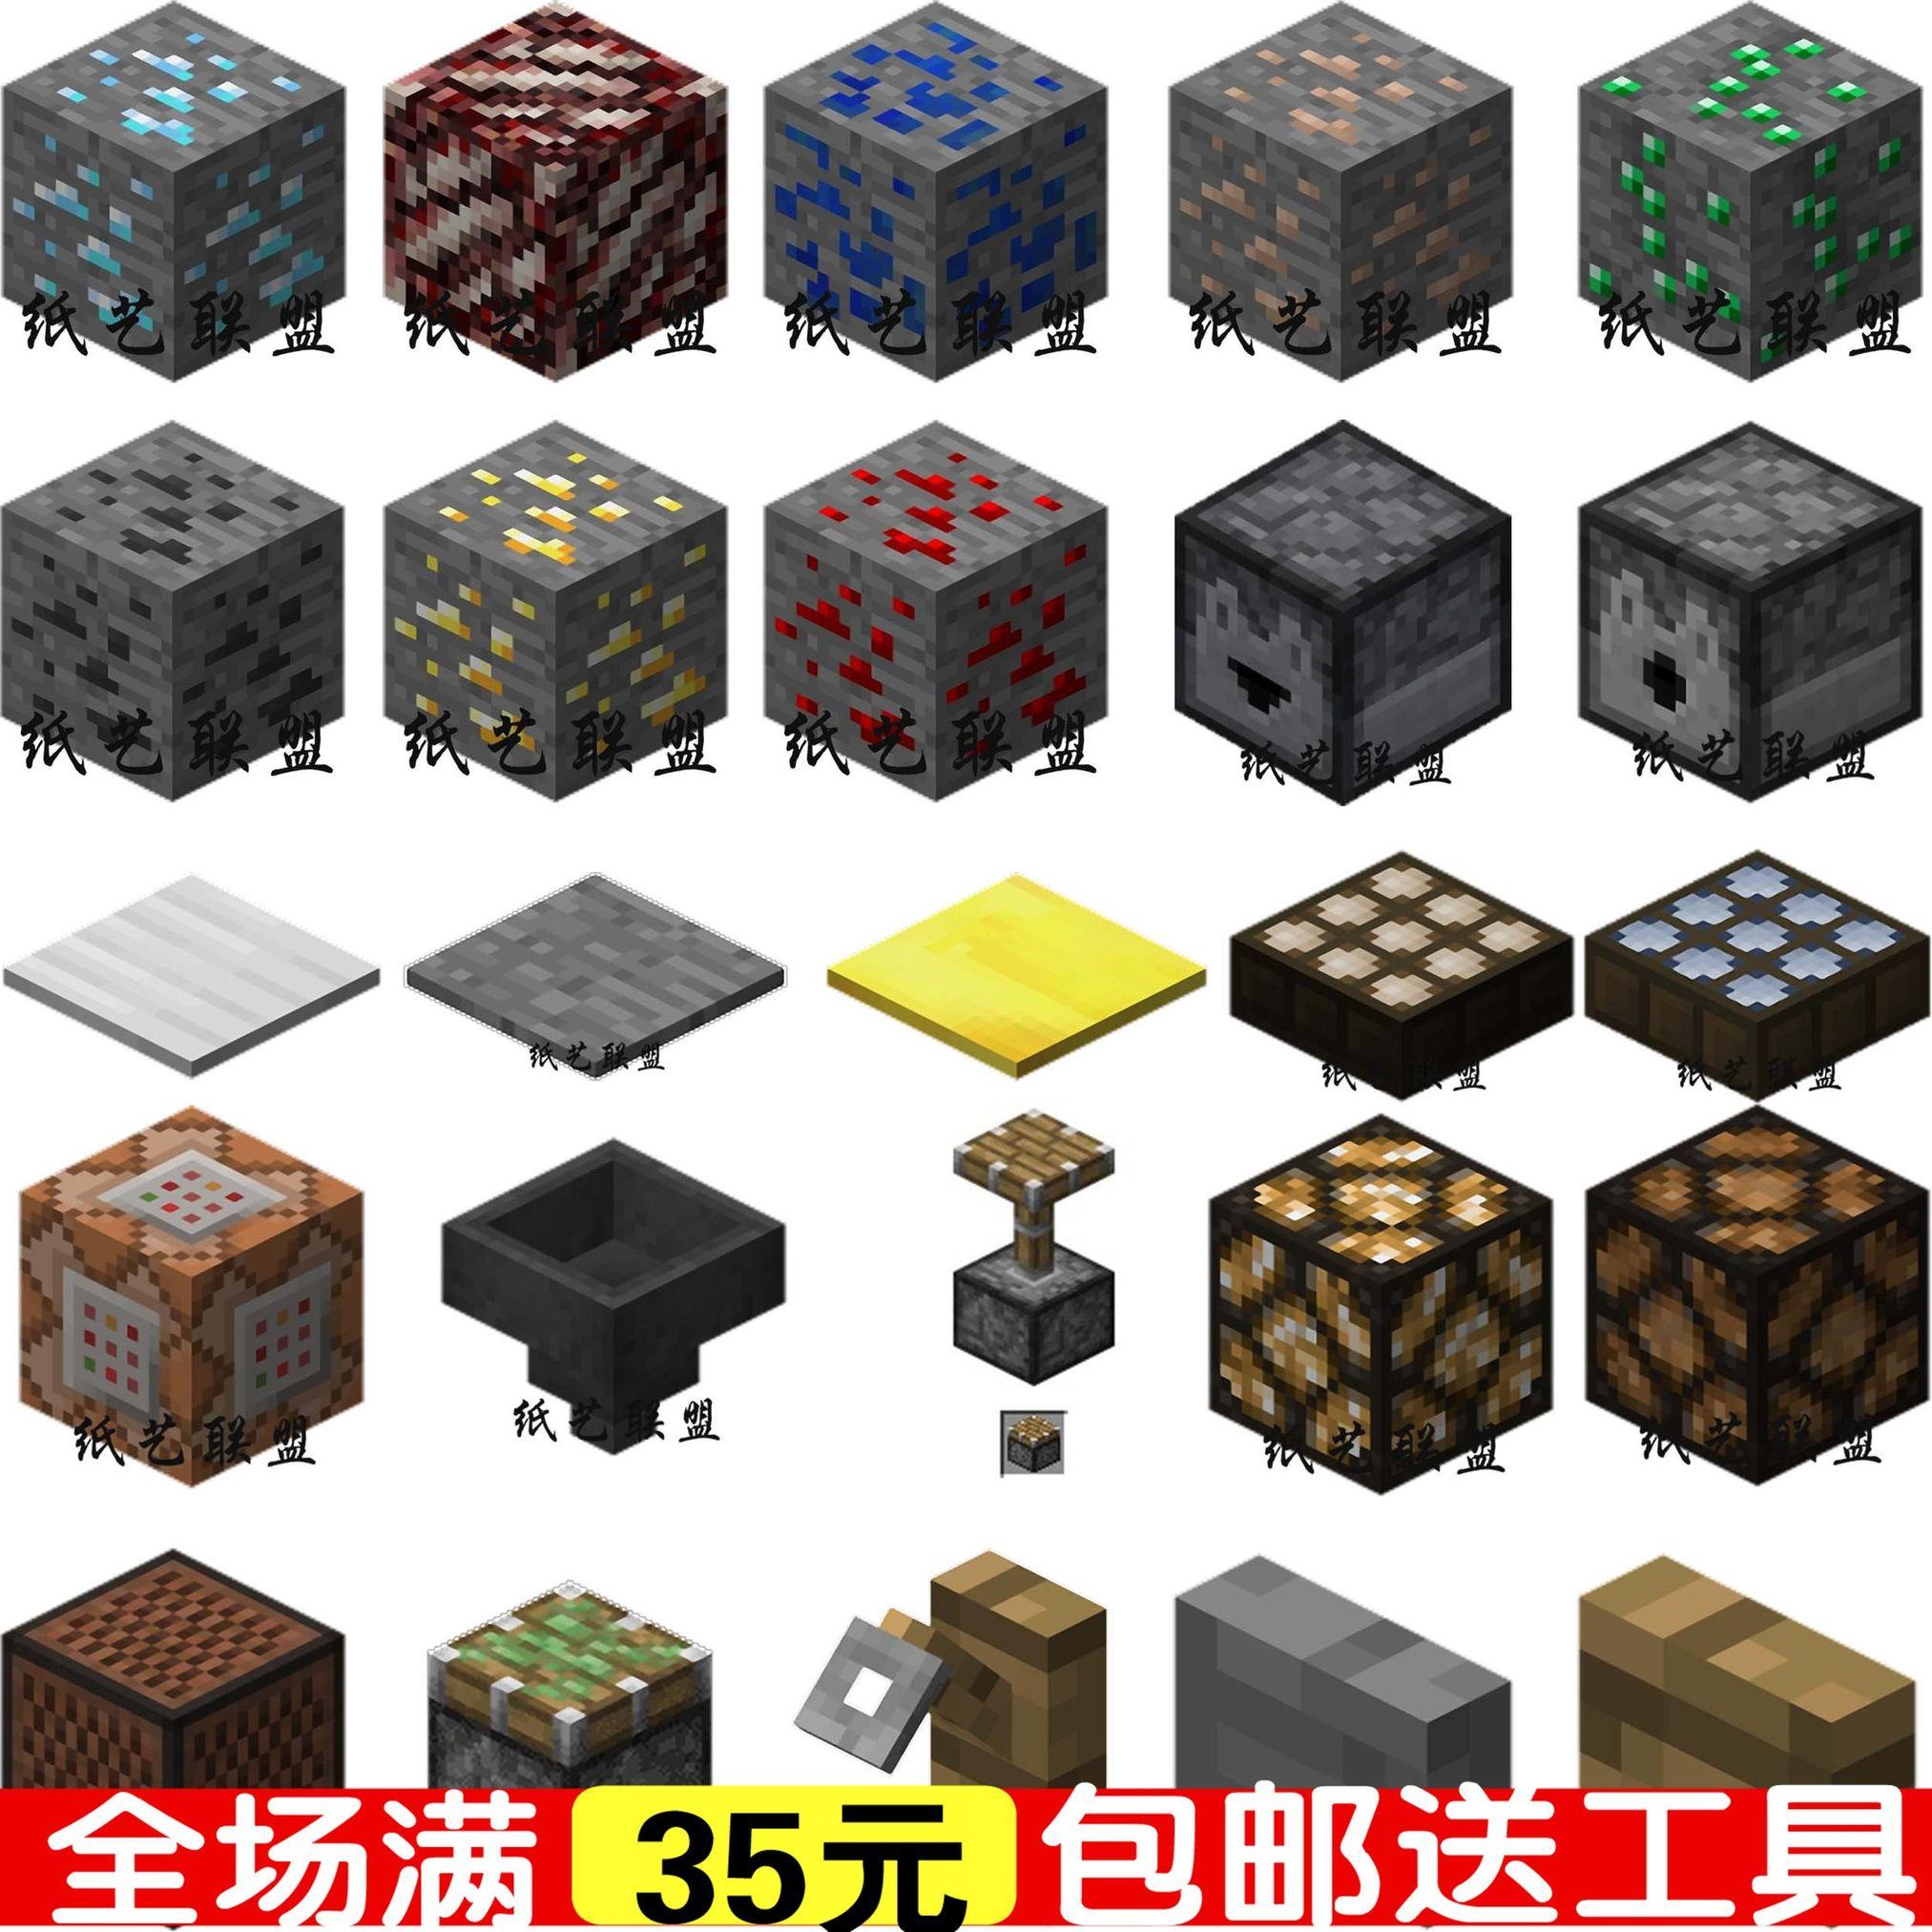 Minecraft我的世界周边玩具纸模型方块大全手工制作 6*6*6厘米 ①